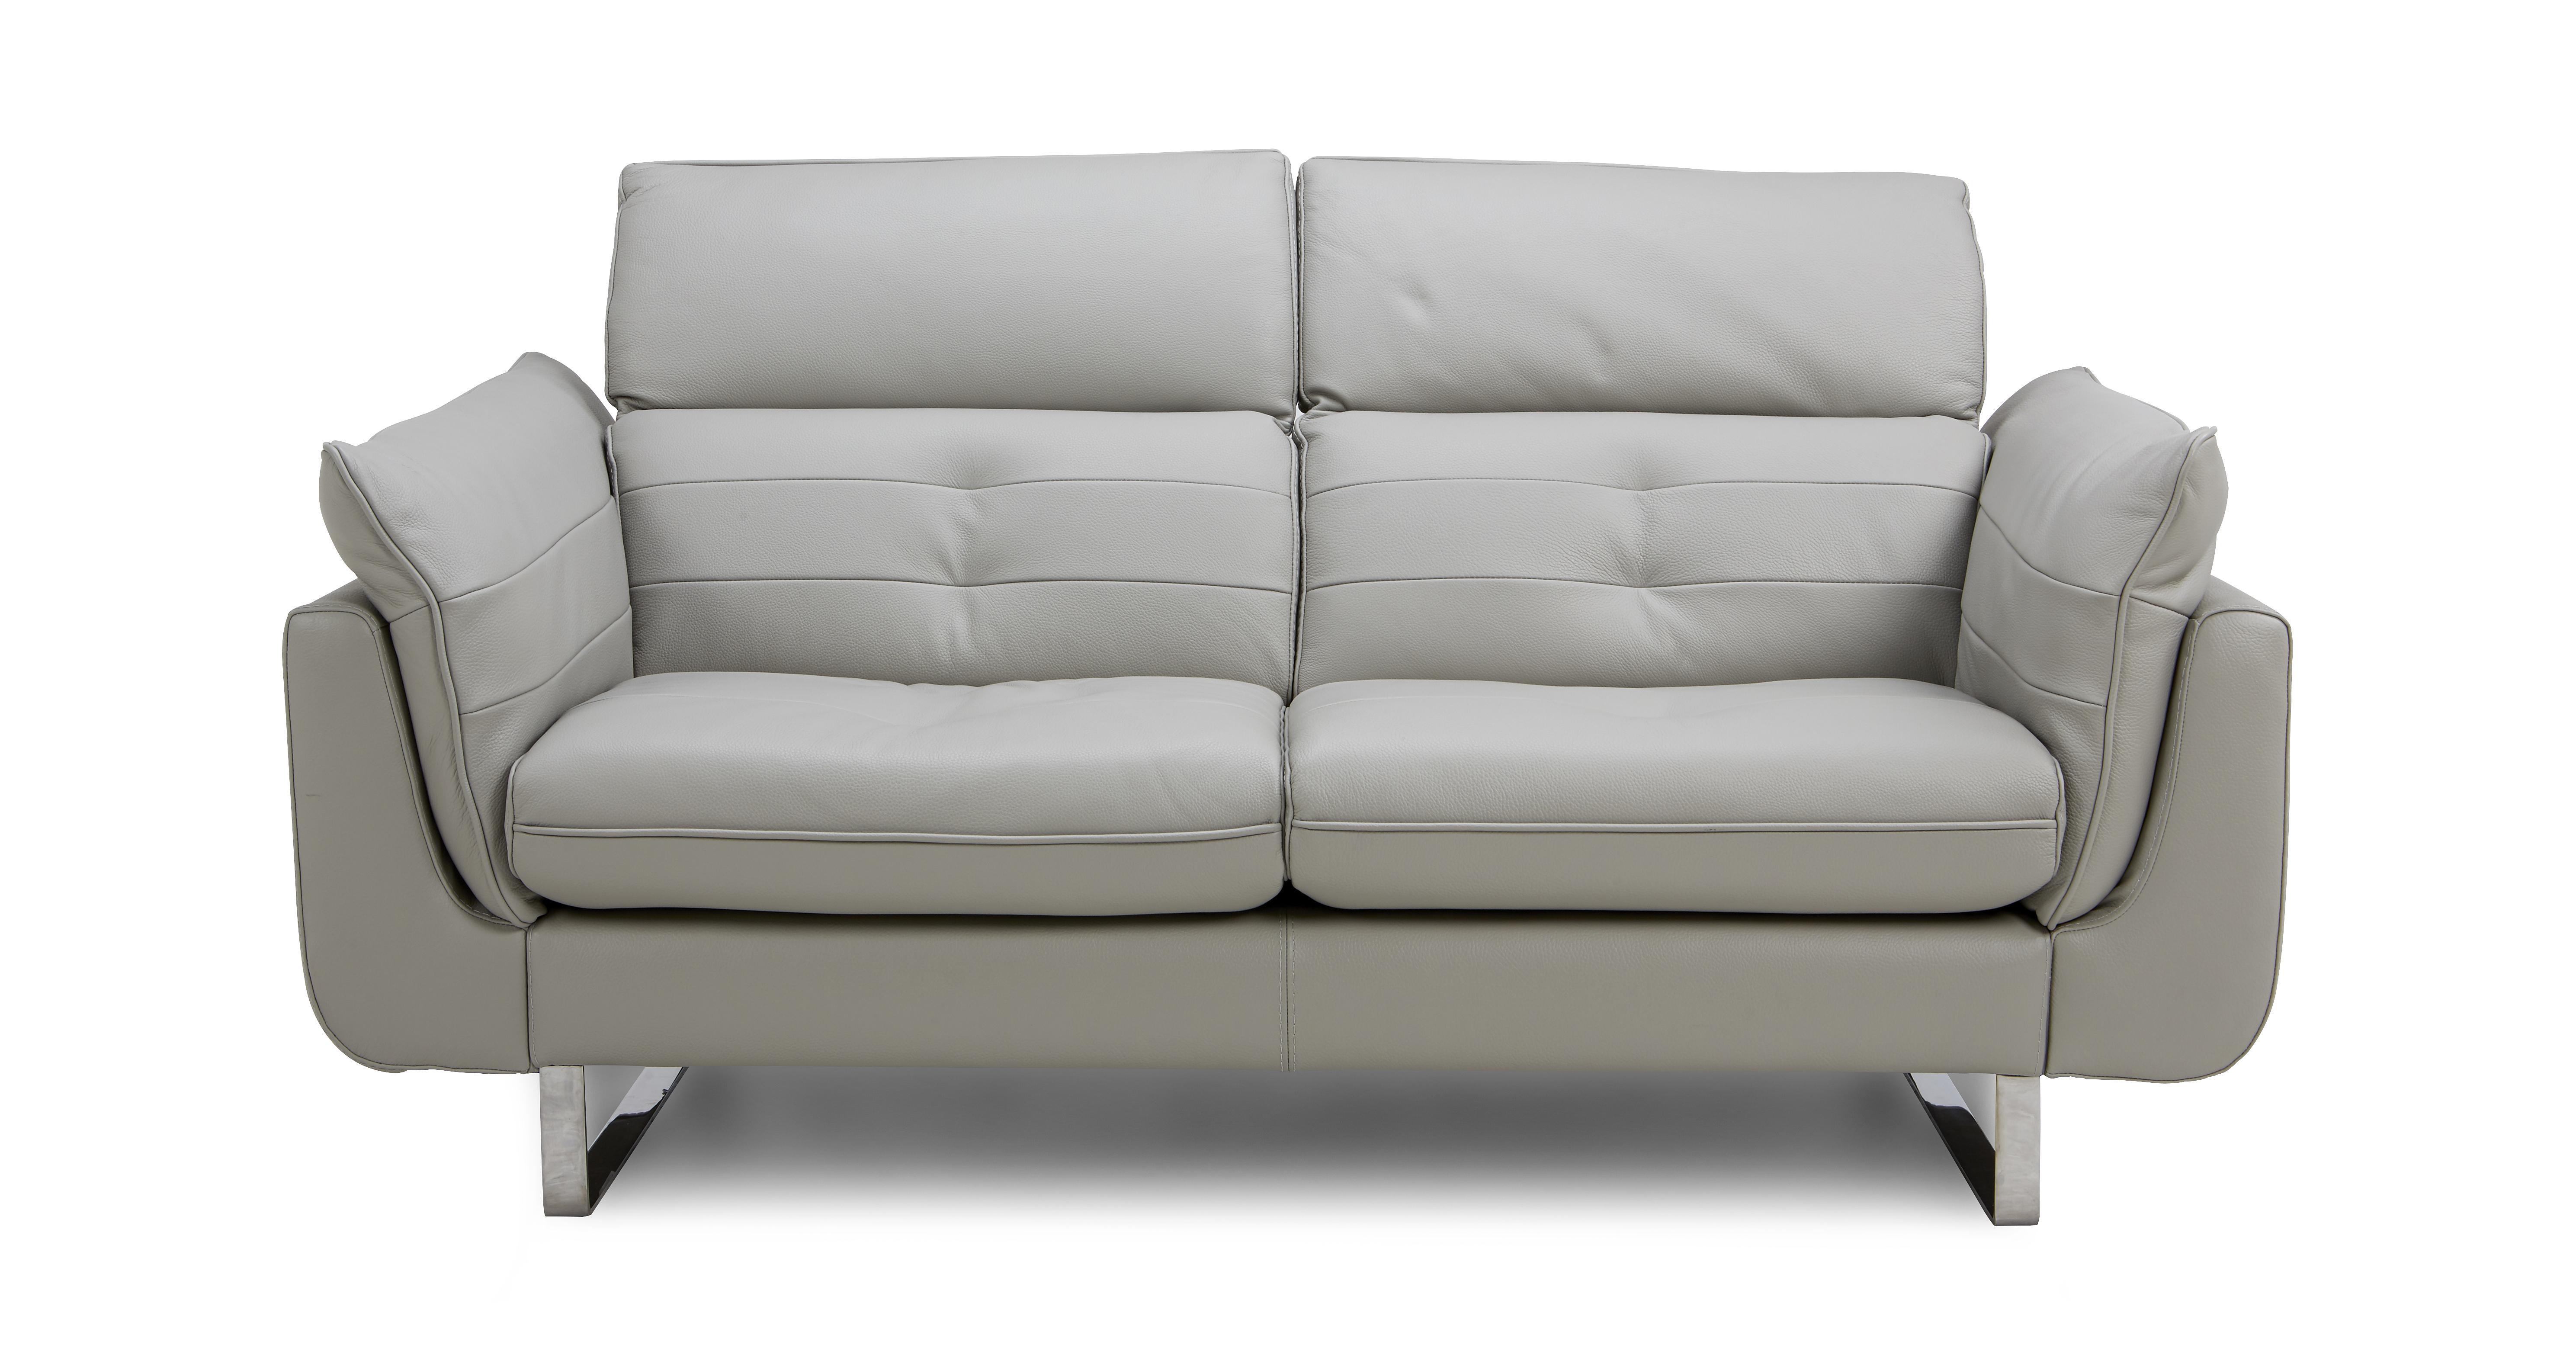 Positano 2 Seater Sofa Taiga | DFS